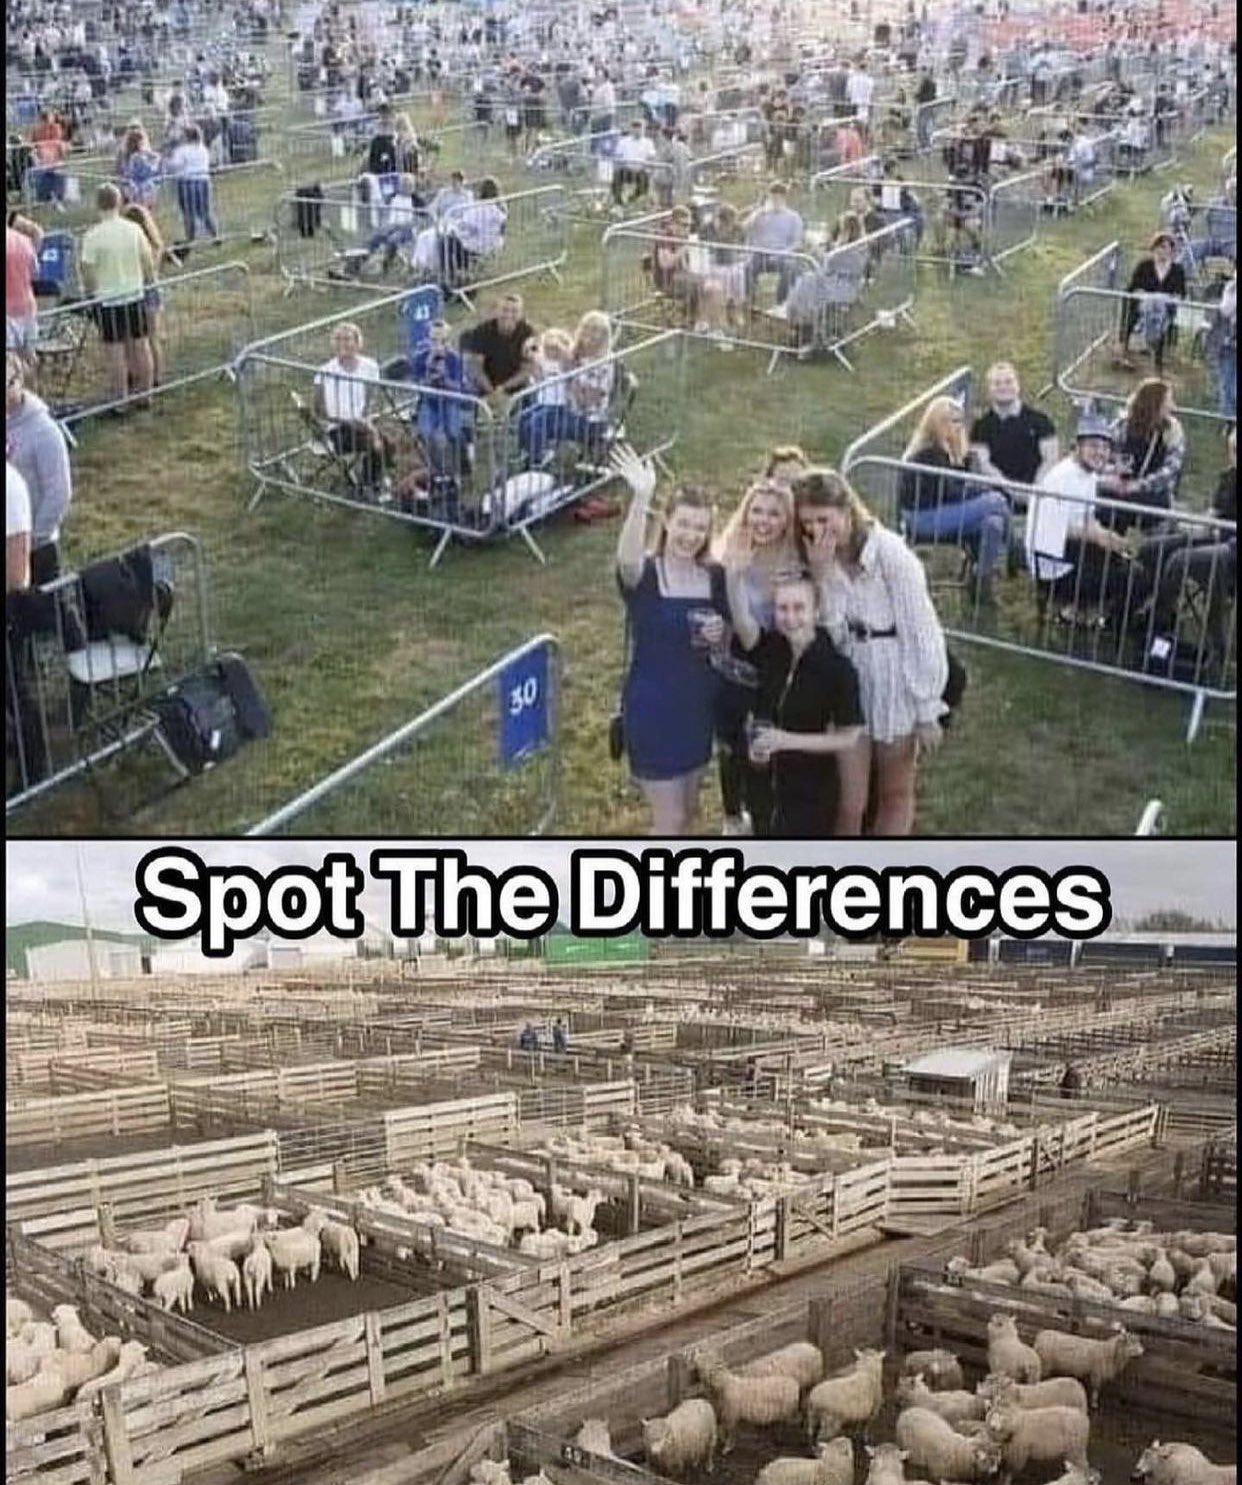 Sheeple?